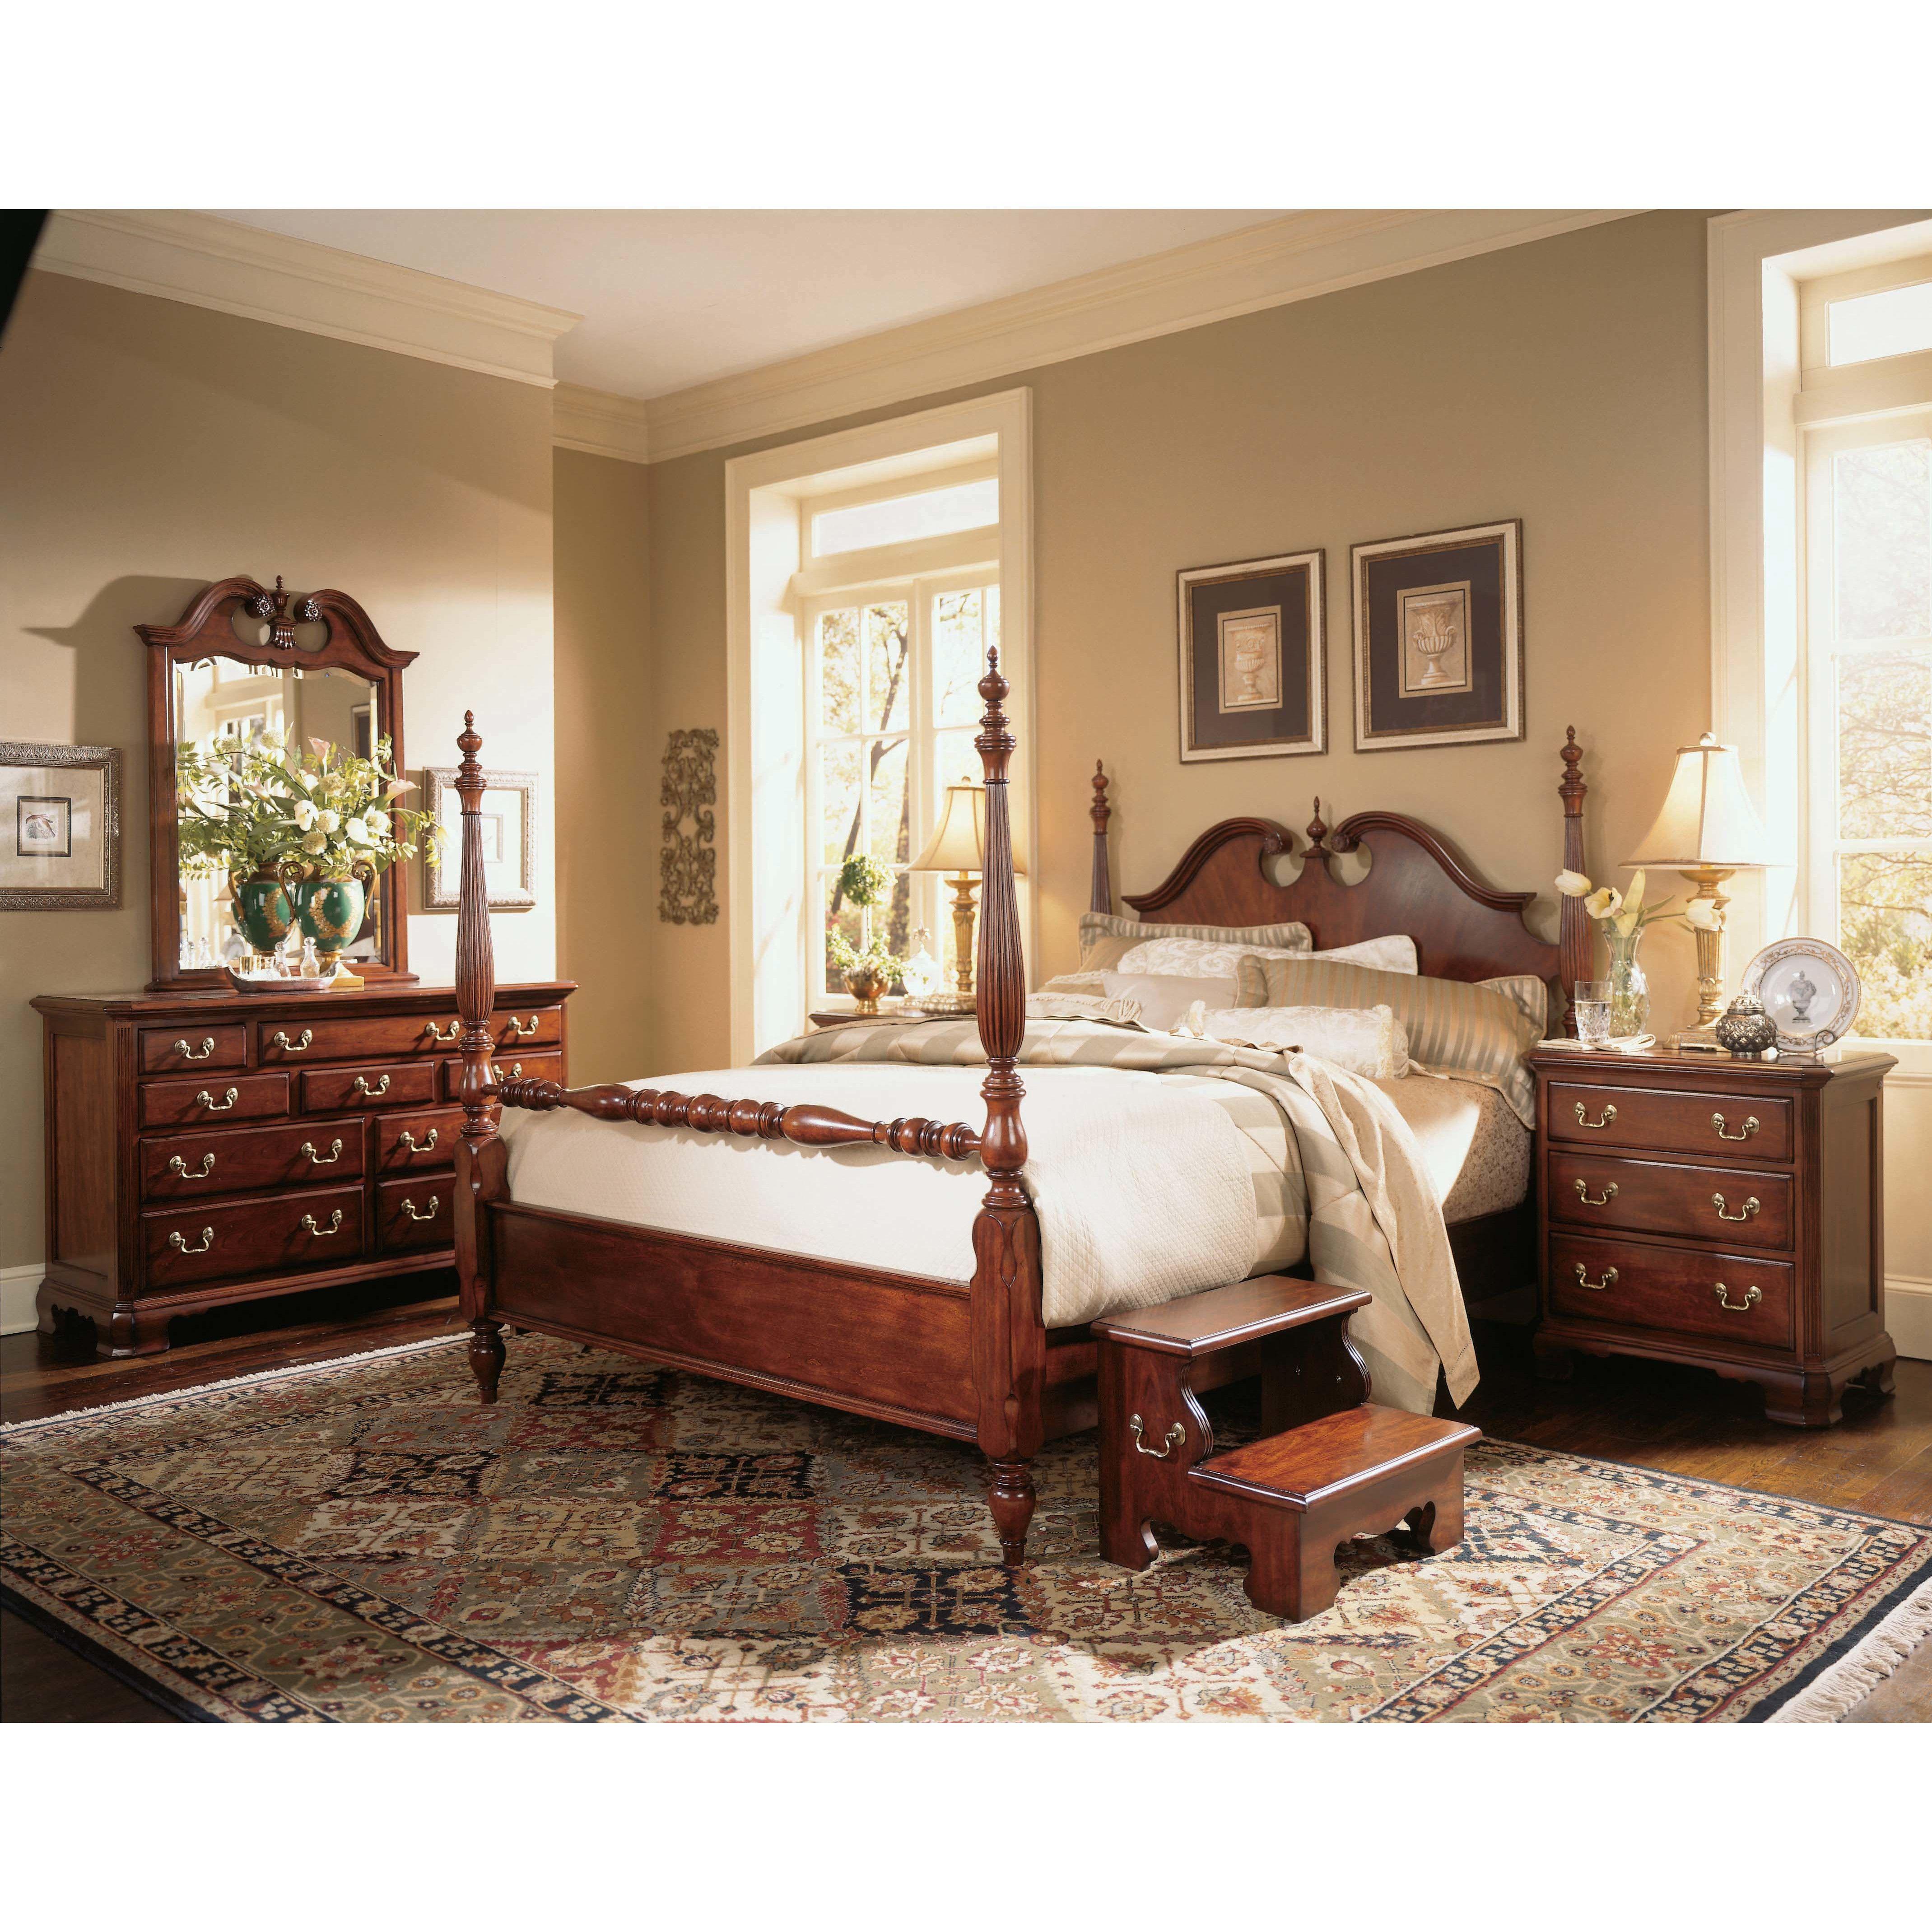 American Drew Cherry Grove Four Poster Customizable Bedroom Set ...